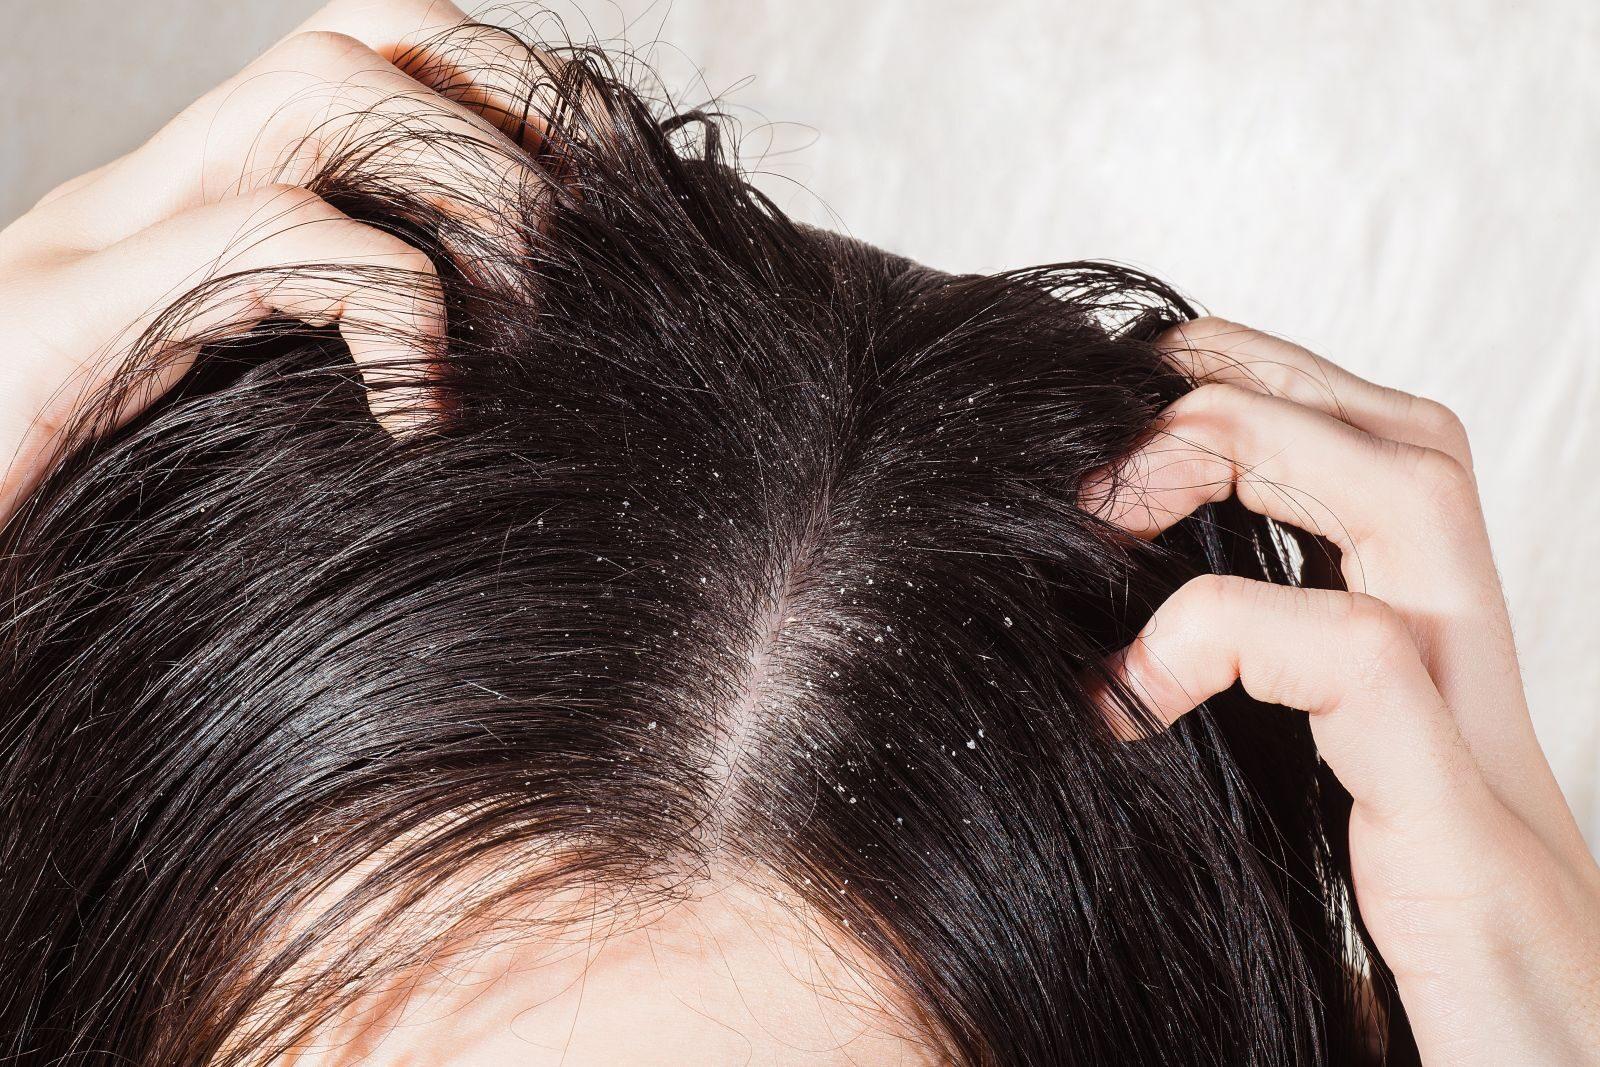 vörös foltok a fejbőr haján hullanak